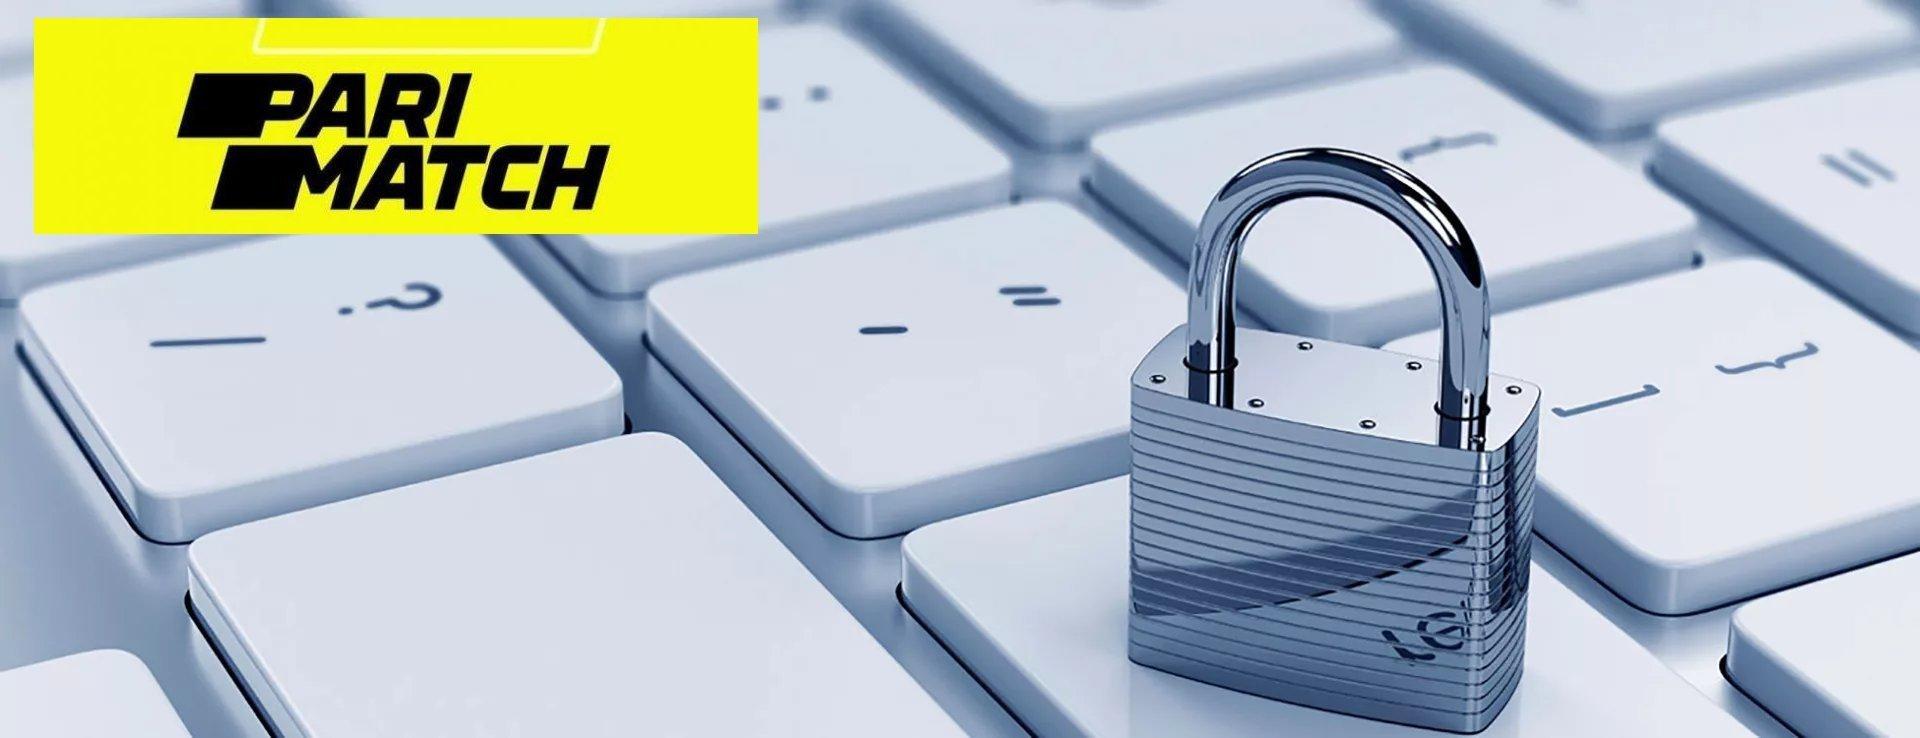 Privacy Policy Pari Match